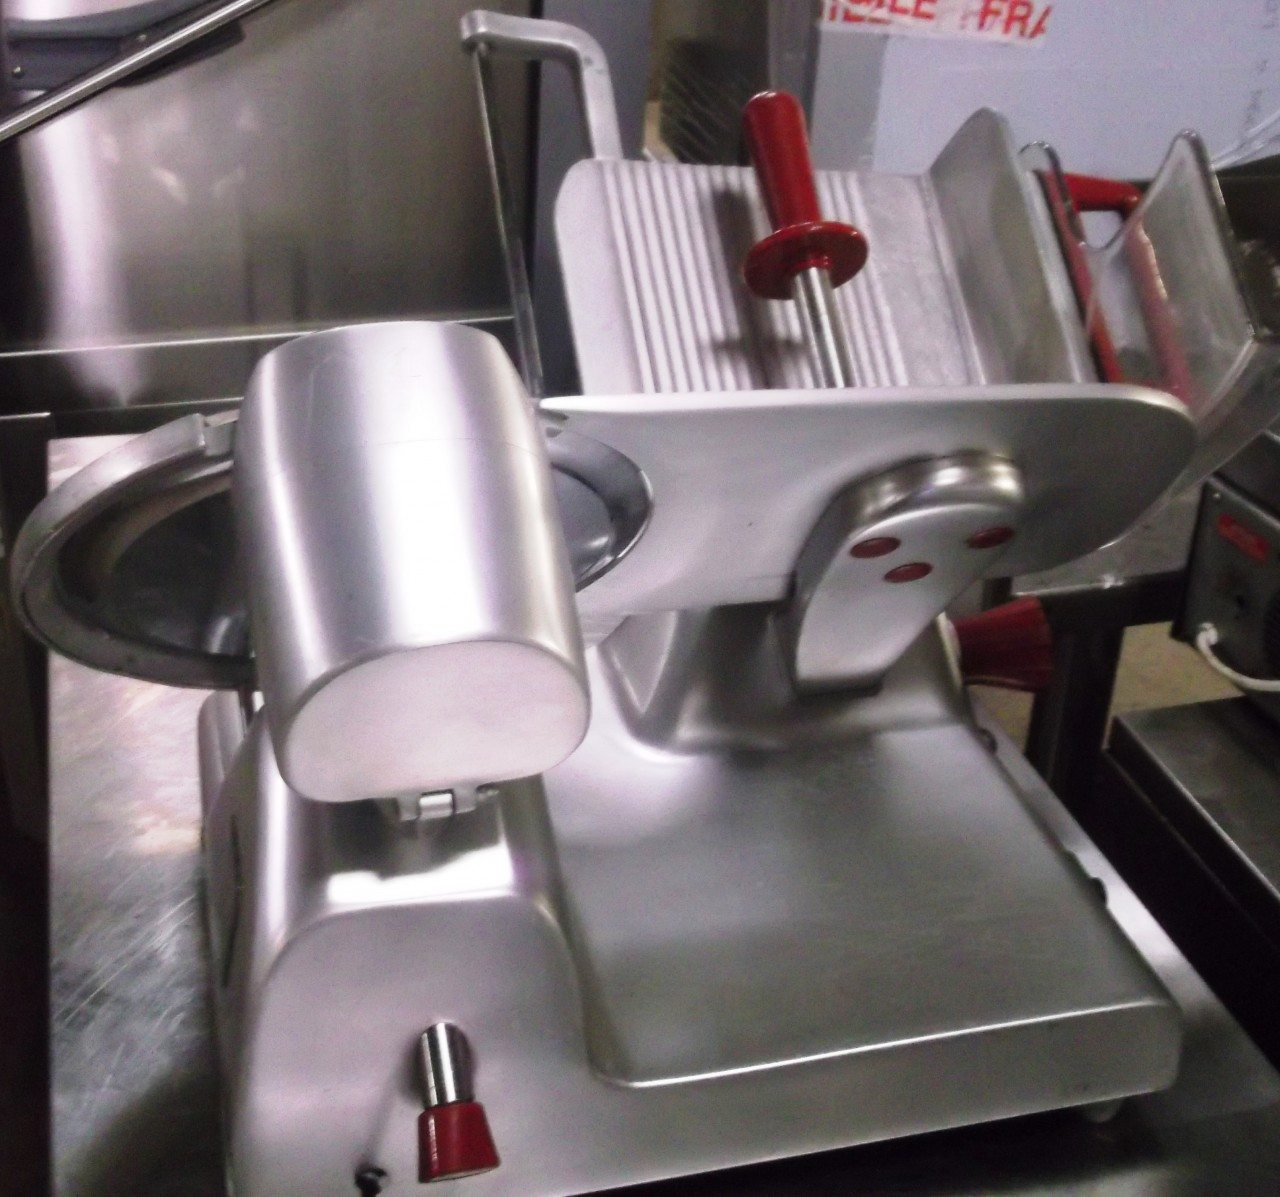 AVERY BERKEL 12 inch Gravity Feed meat Slicer